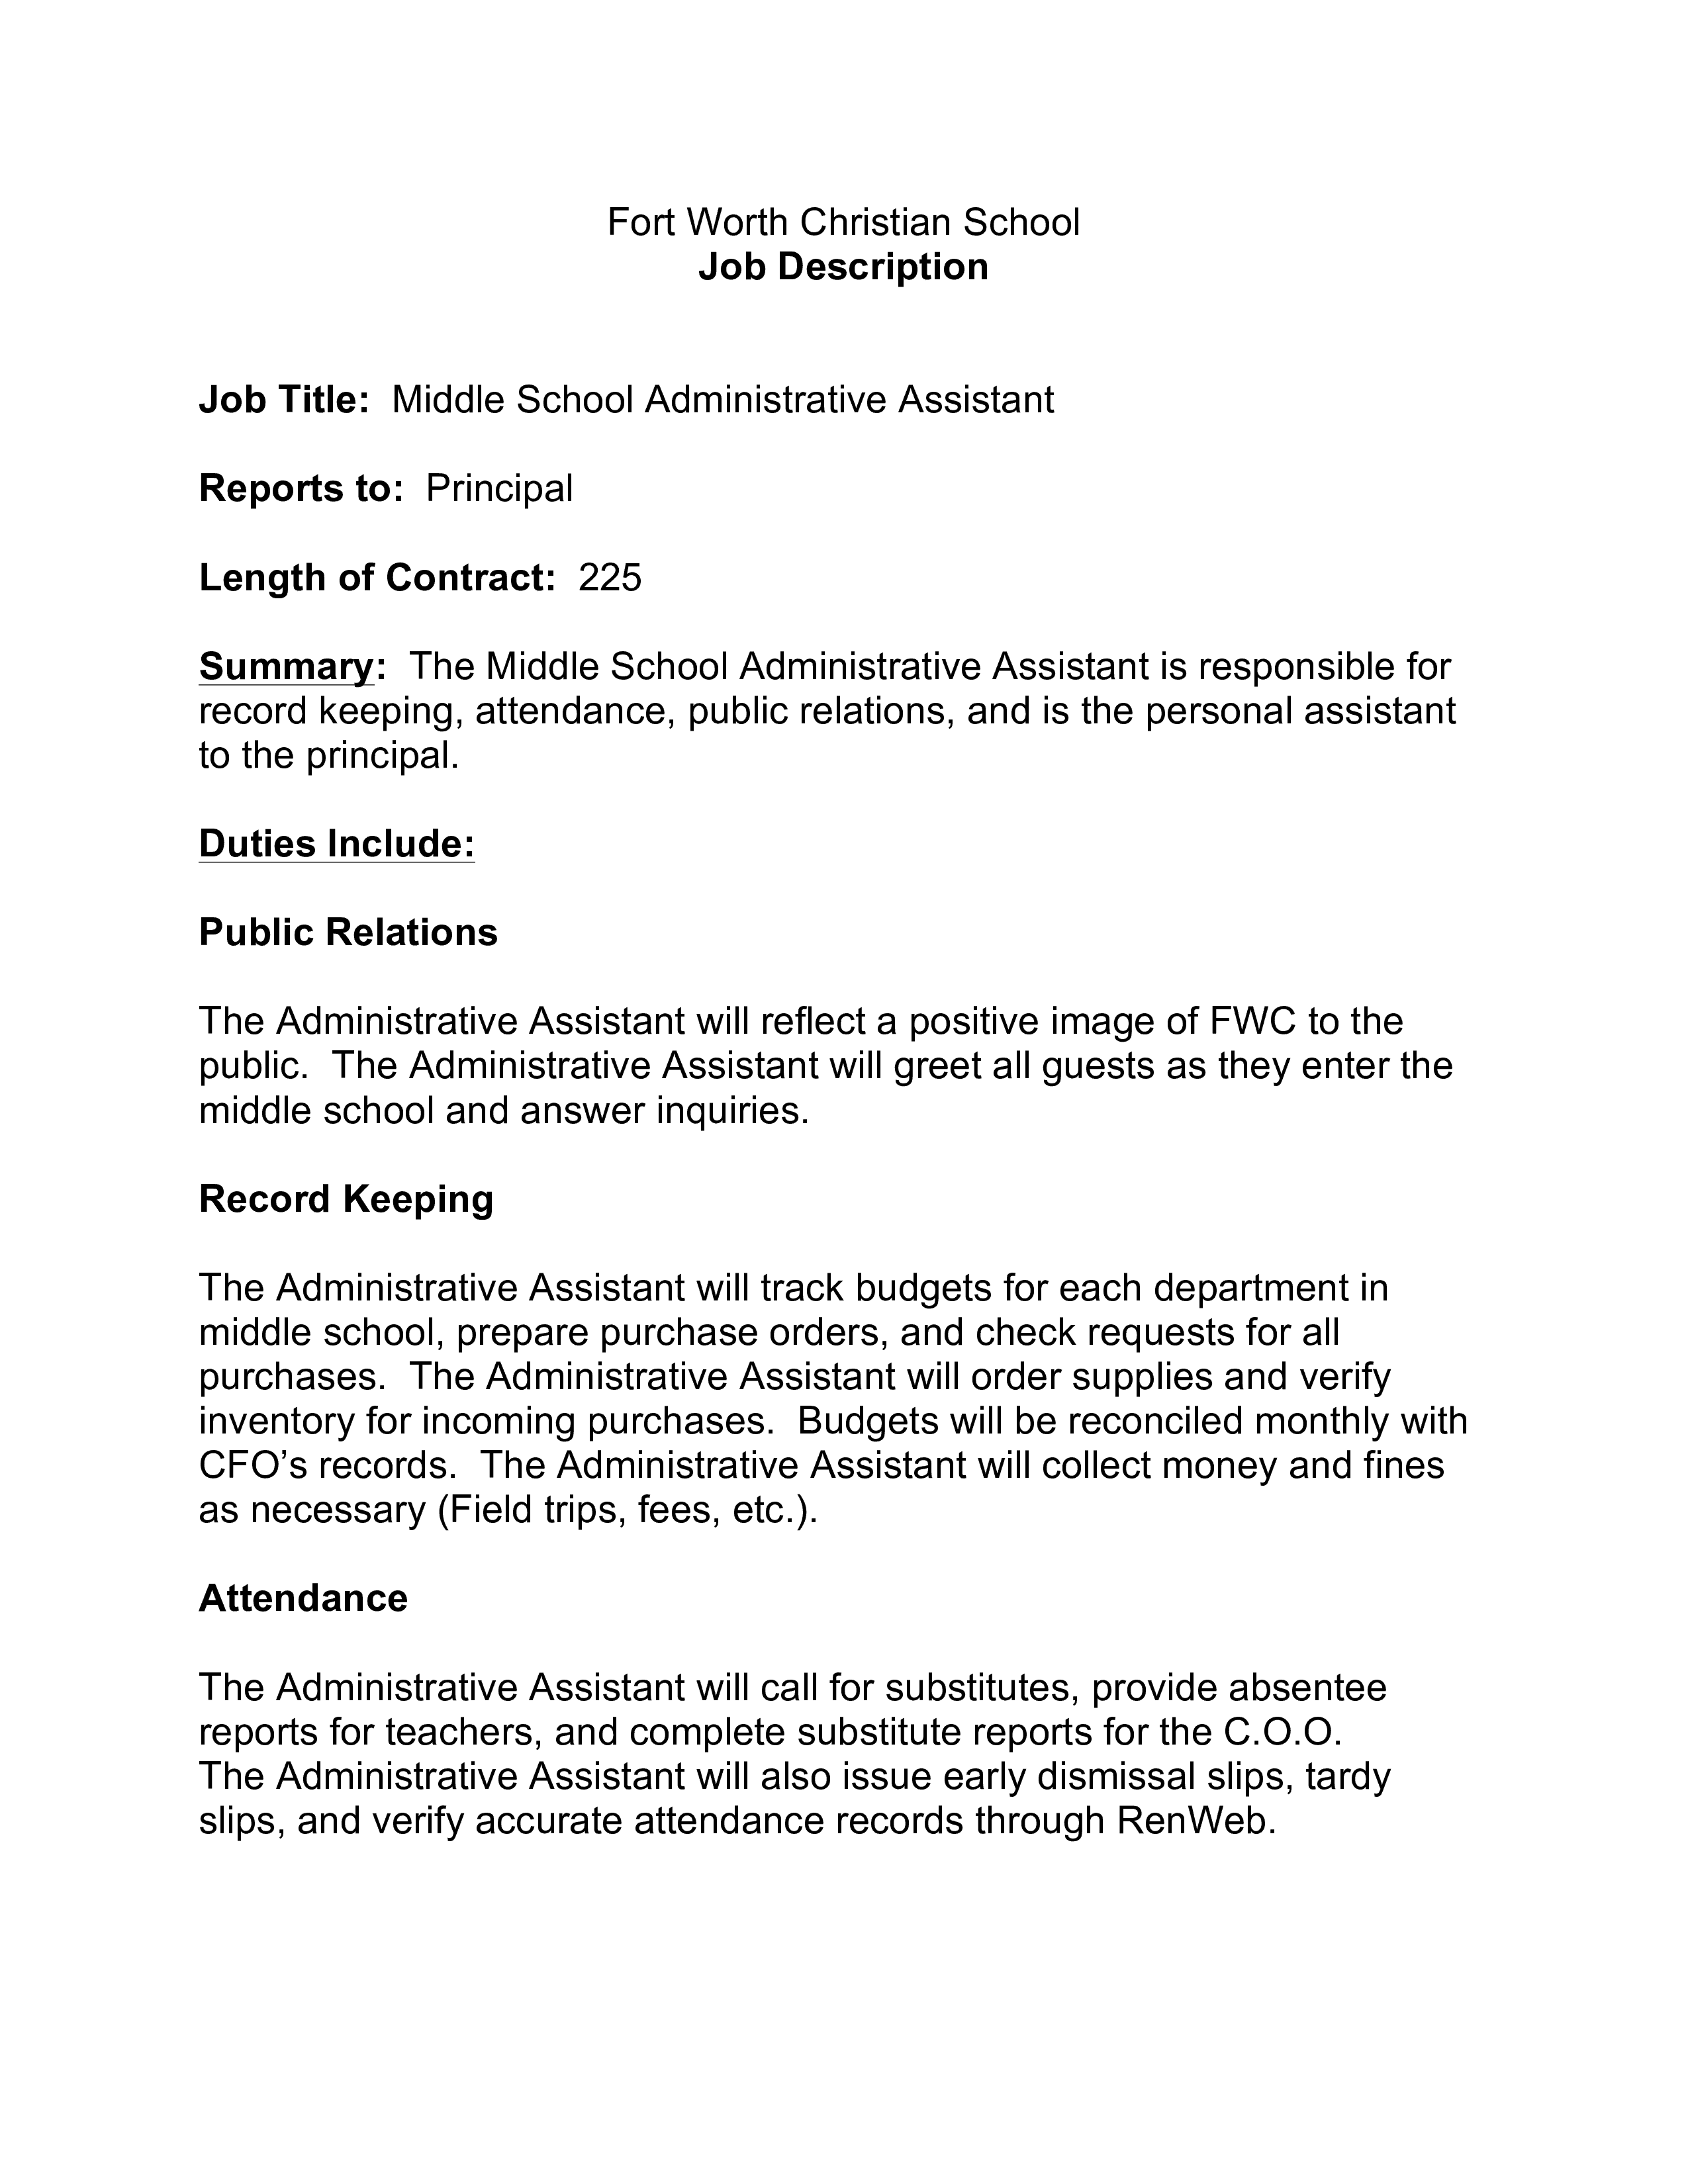 school-administration-job-responsibilities